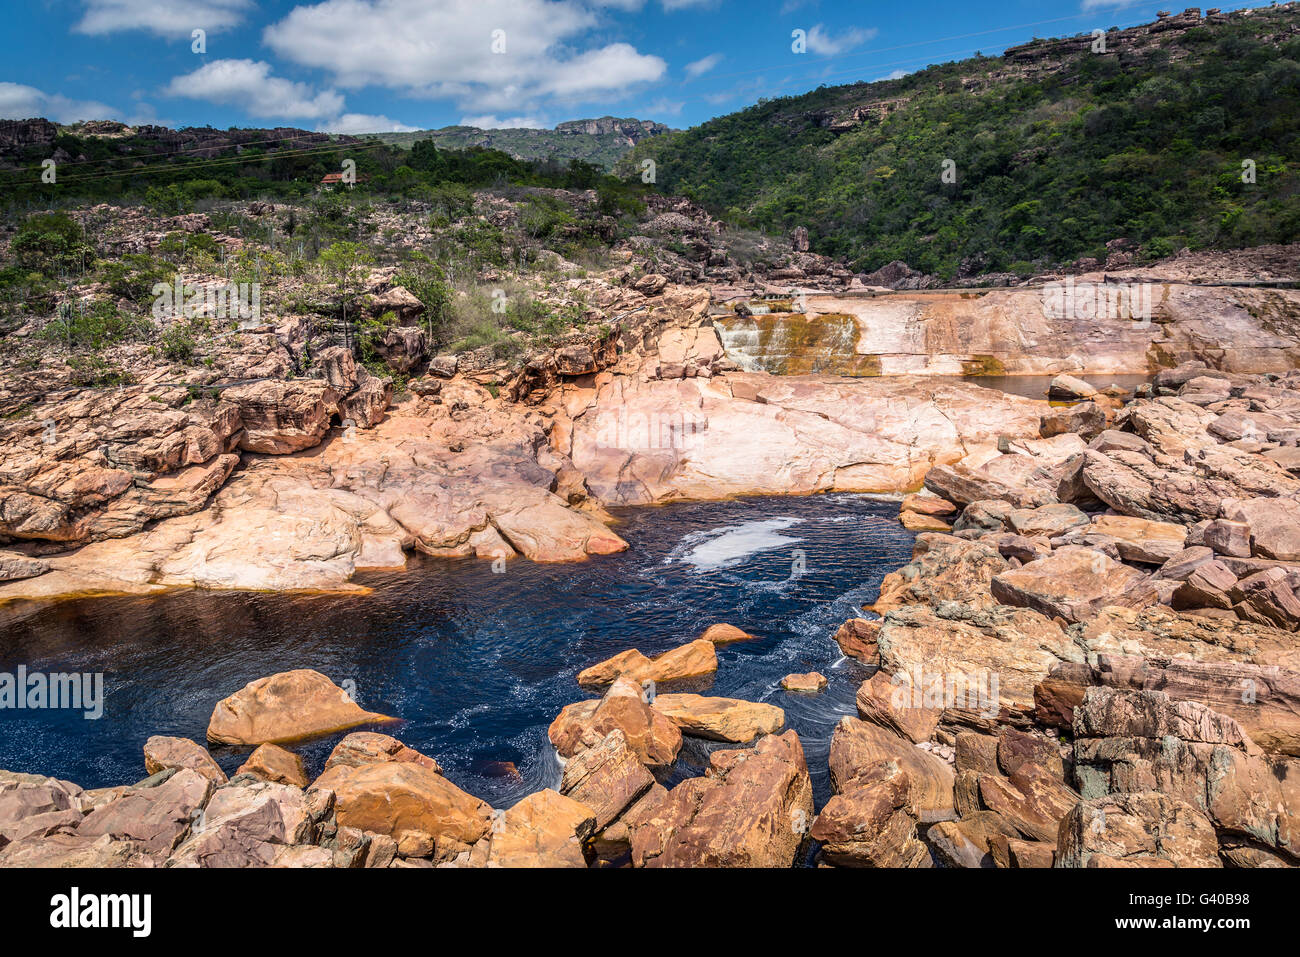 Paraguacu river, Chapada Diamantina, Bahia, Brazil - Stock Image